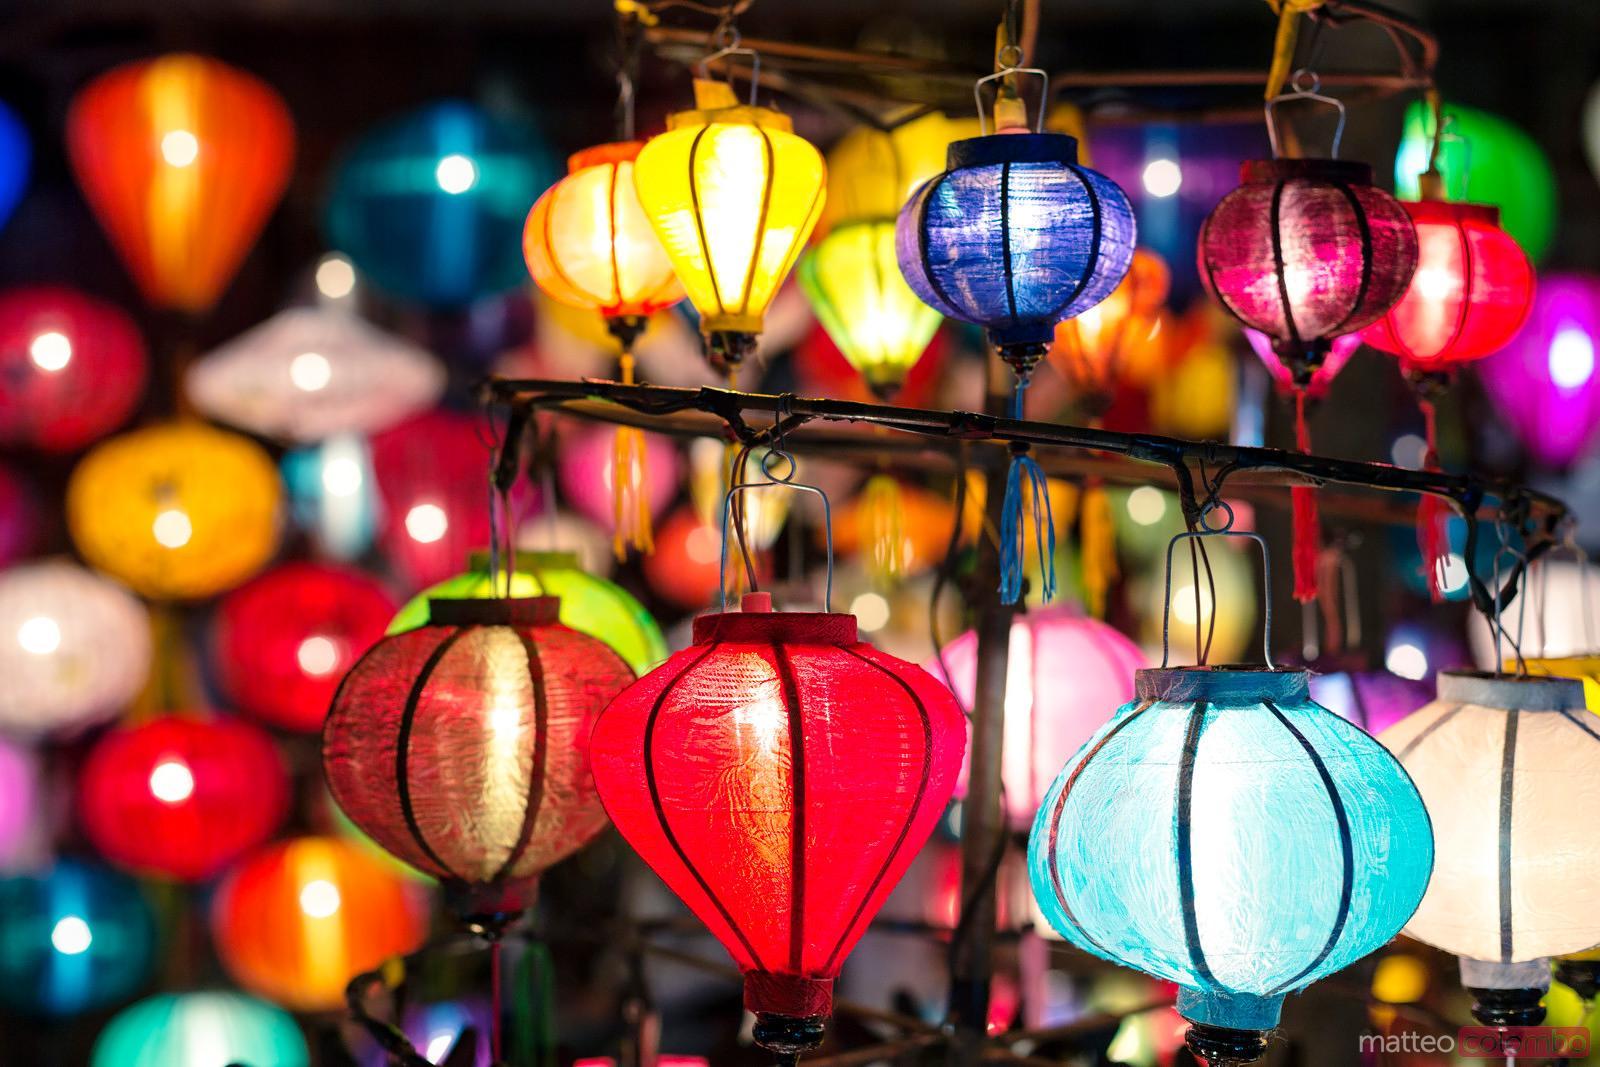 Matteo Colombo Travel Photography | Typical paper lanterns at night ... for Paper Lantern Photography  183qdu